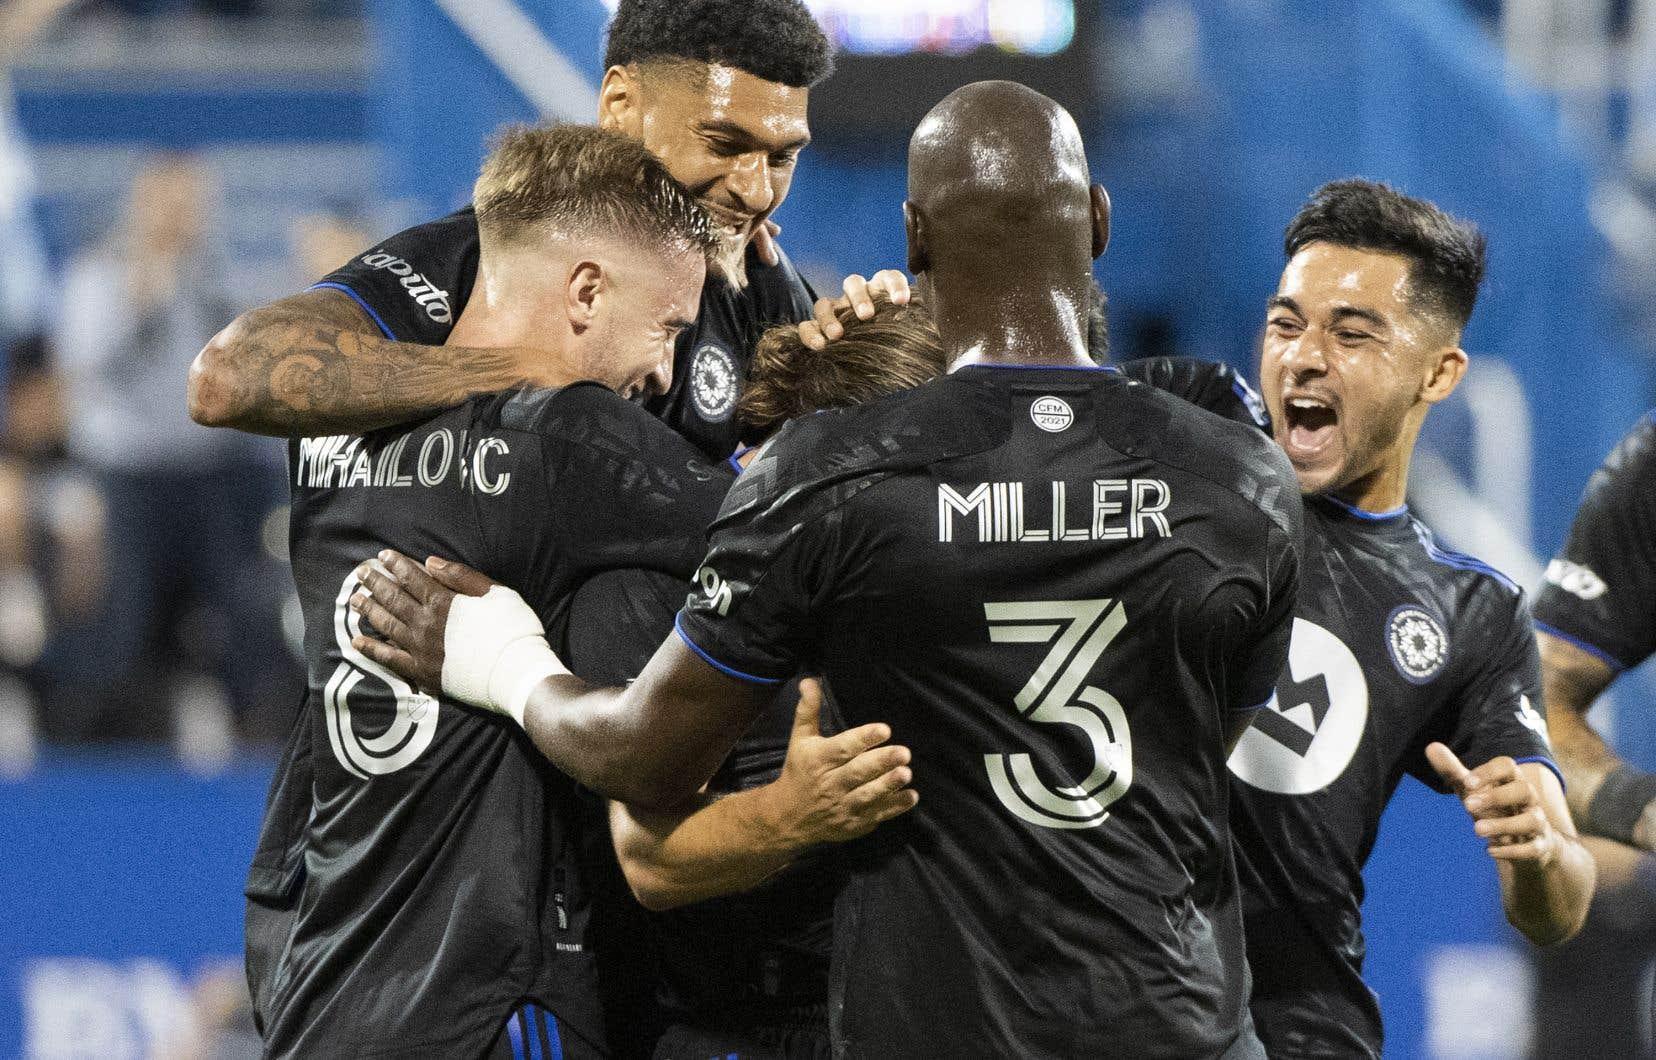 Le CF Montréal a signé une précieuse victoire de 4-2 contre le Orlando City SC, mercredi soir à Orlando.